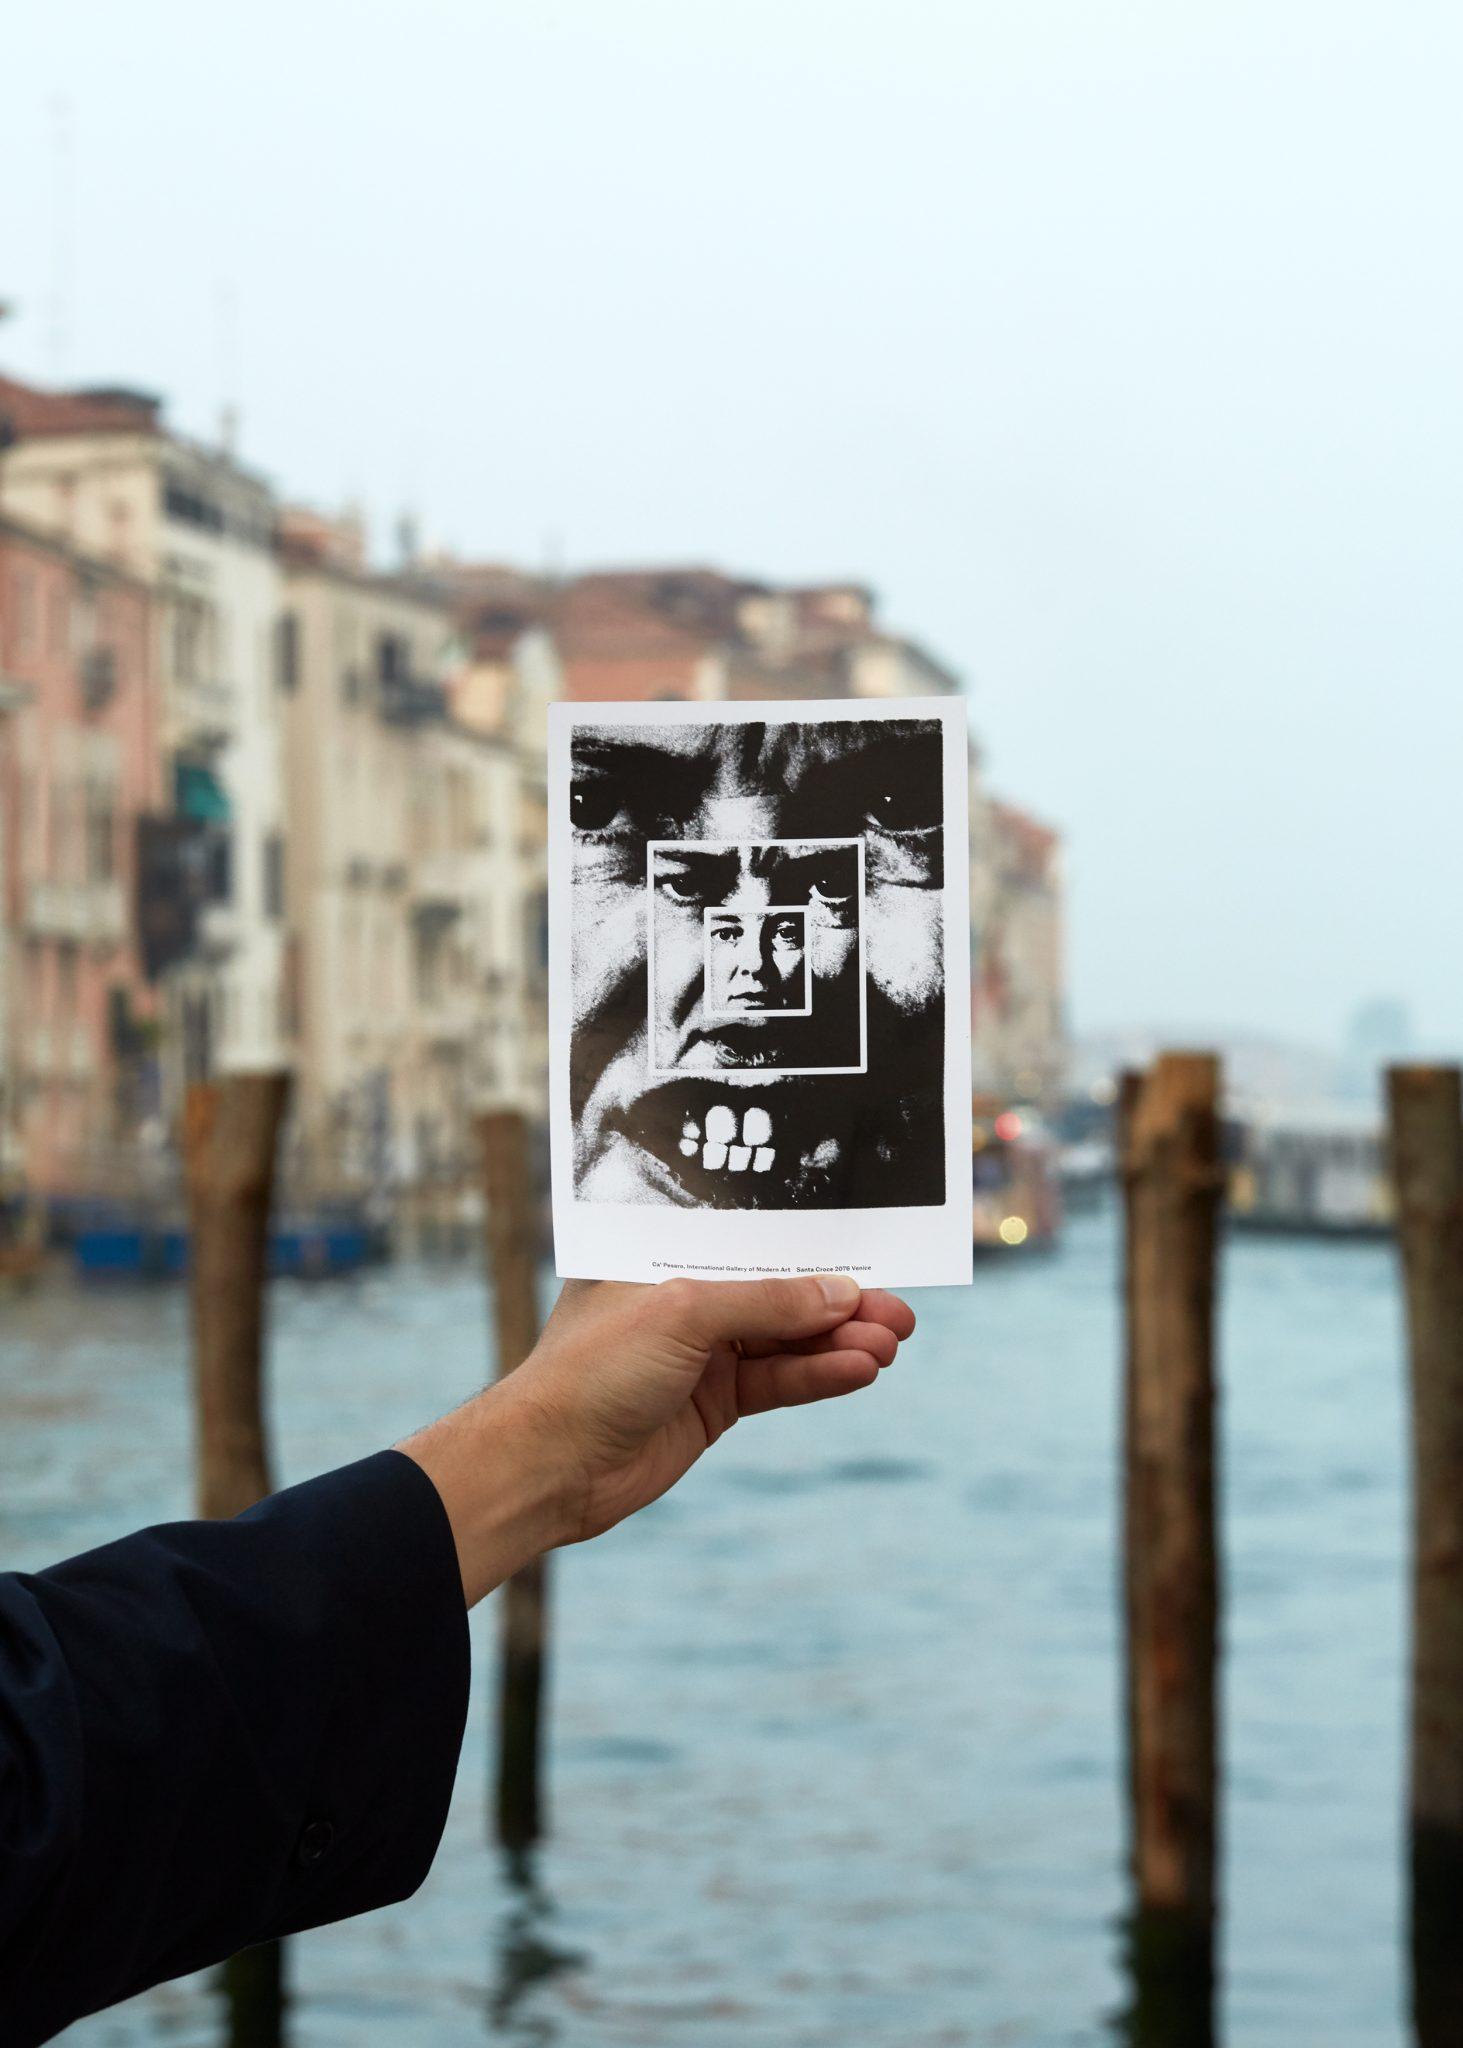 Thomas Adank - Breathless, Ca Pesaro Venice - Collaboration with REAL Foundation